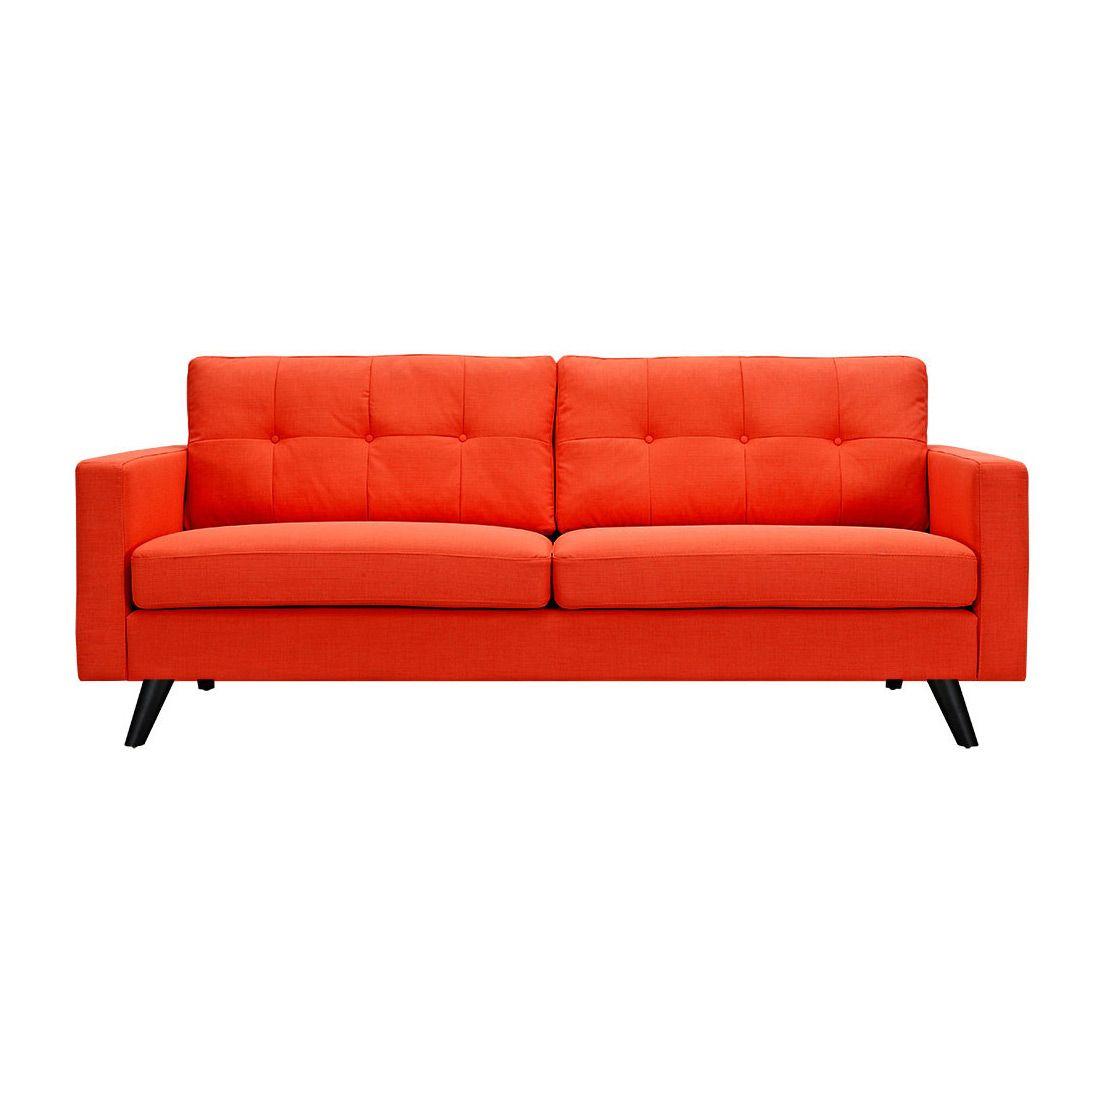 Graham Sofa in Red